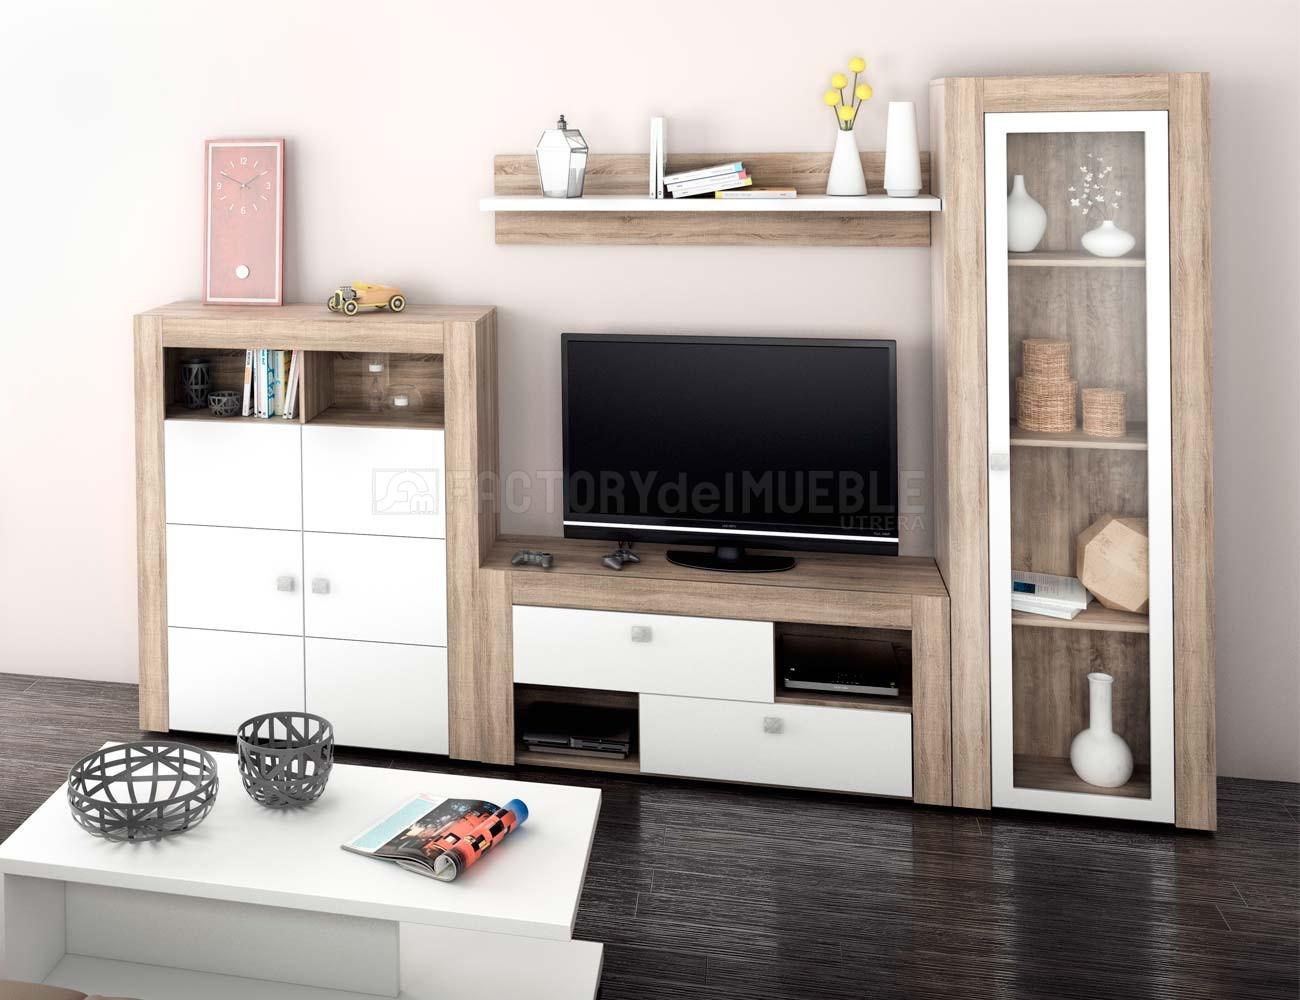 Mueble de salón estilo moderno en cambrian con blanco (22970 ...